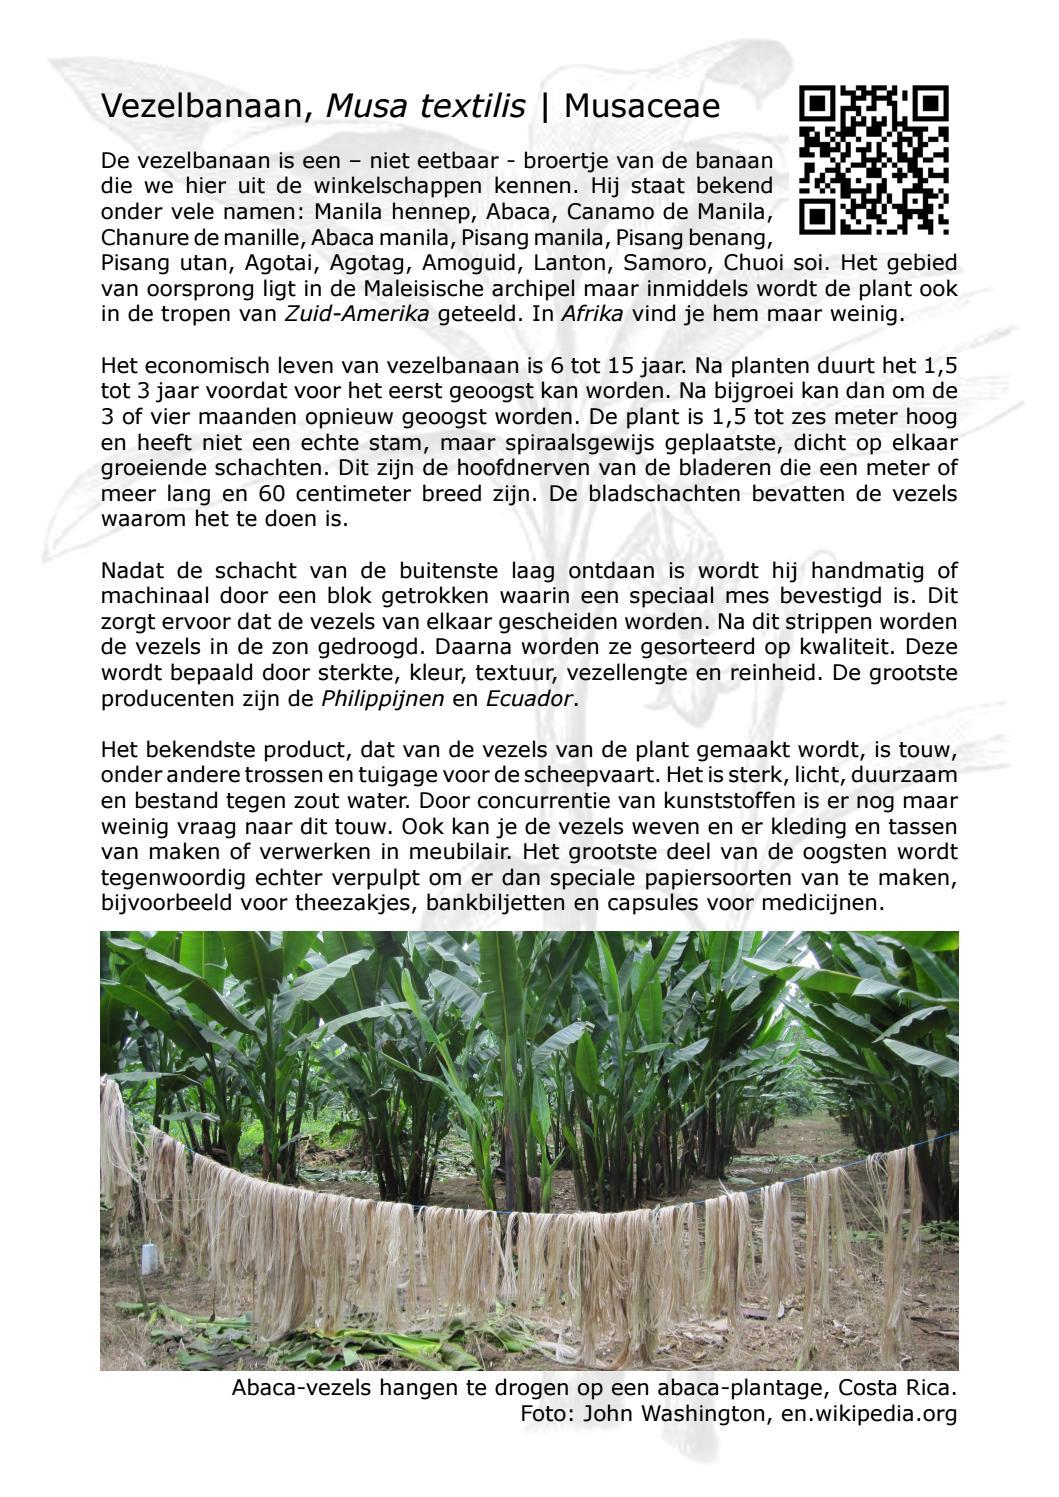 Gebruiksplanten Pamflet By Tu Delft Issuu